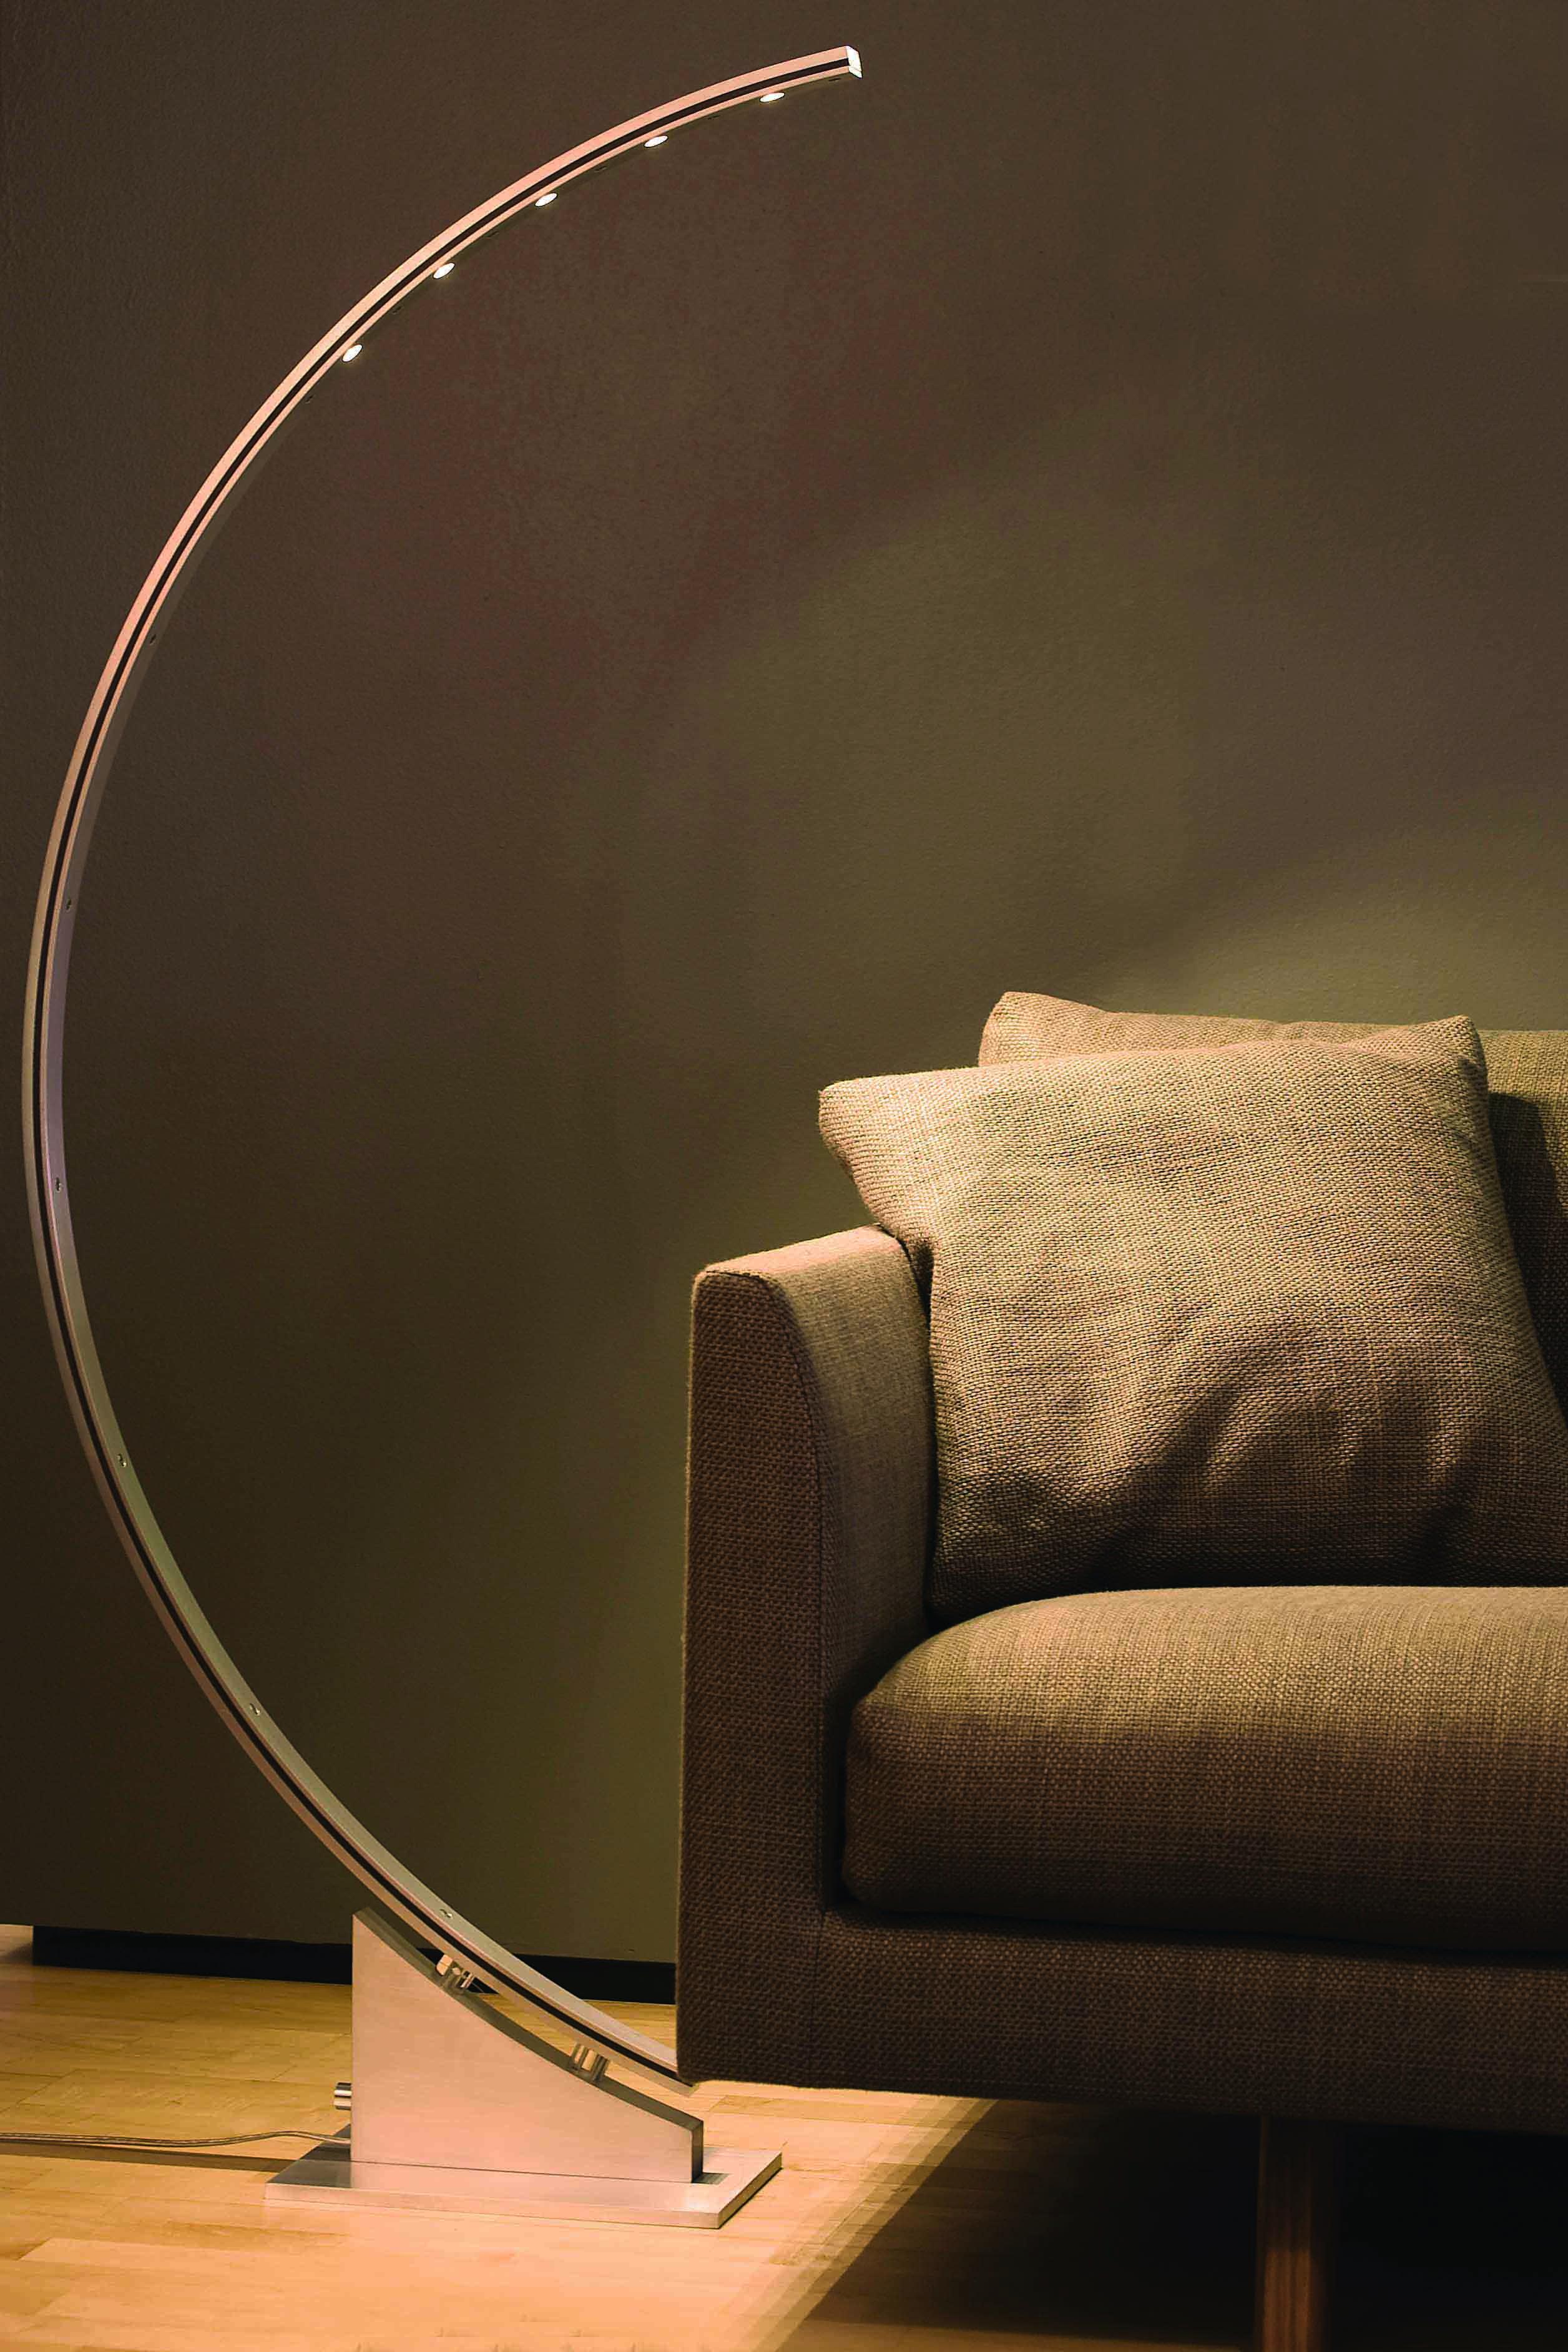 B.E.S. - Beautiful Energy Saver (free standing) by FERROLIGHT Design